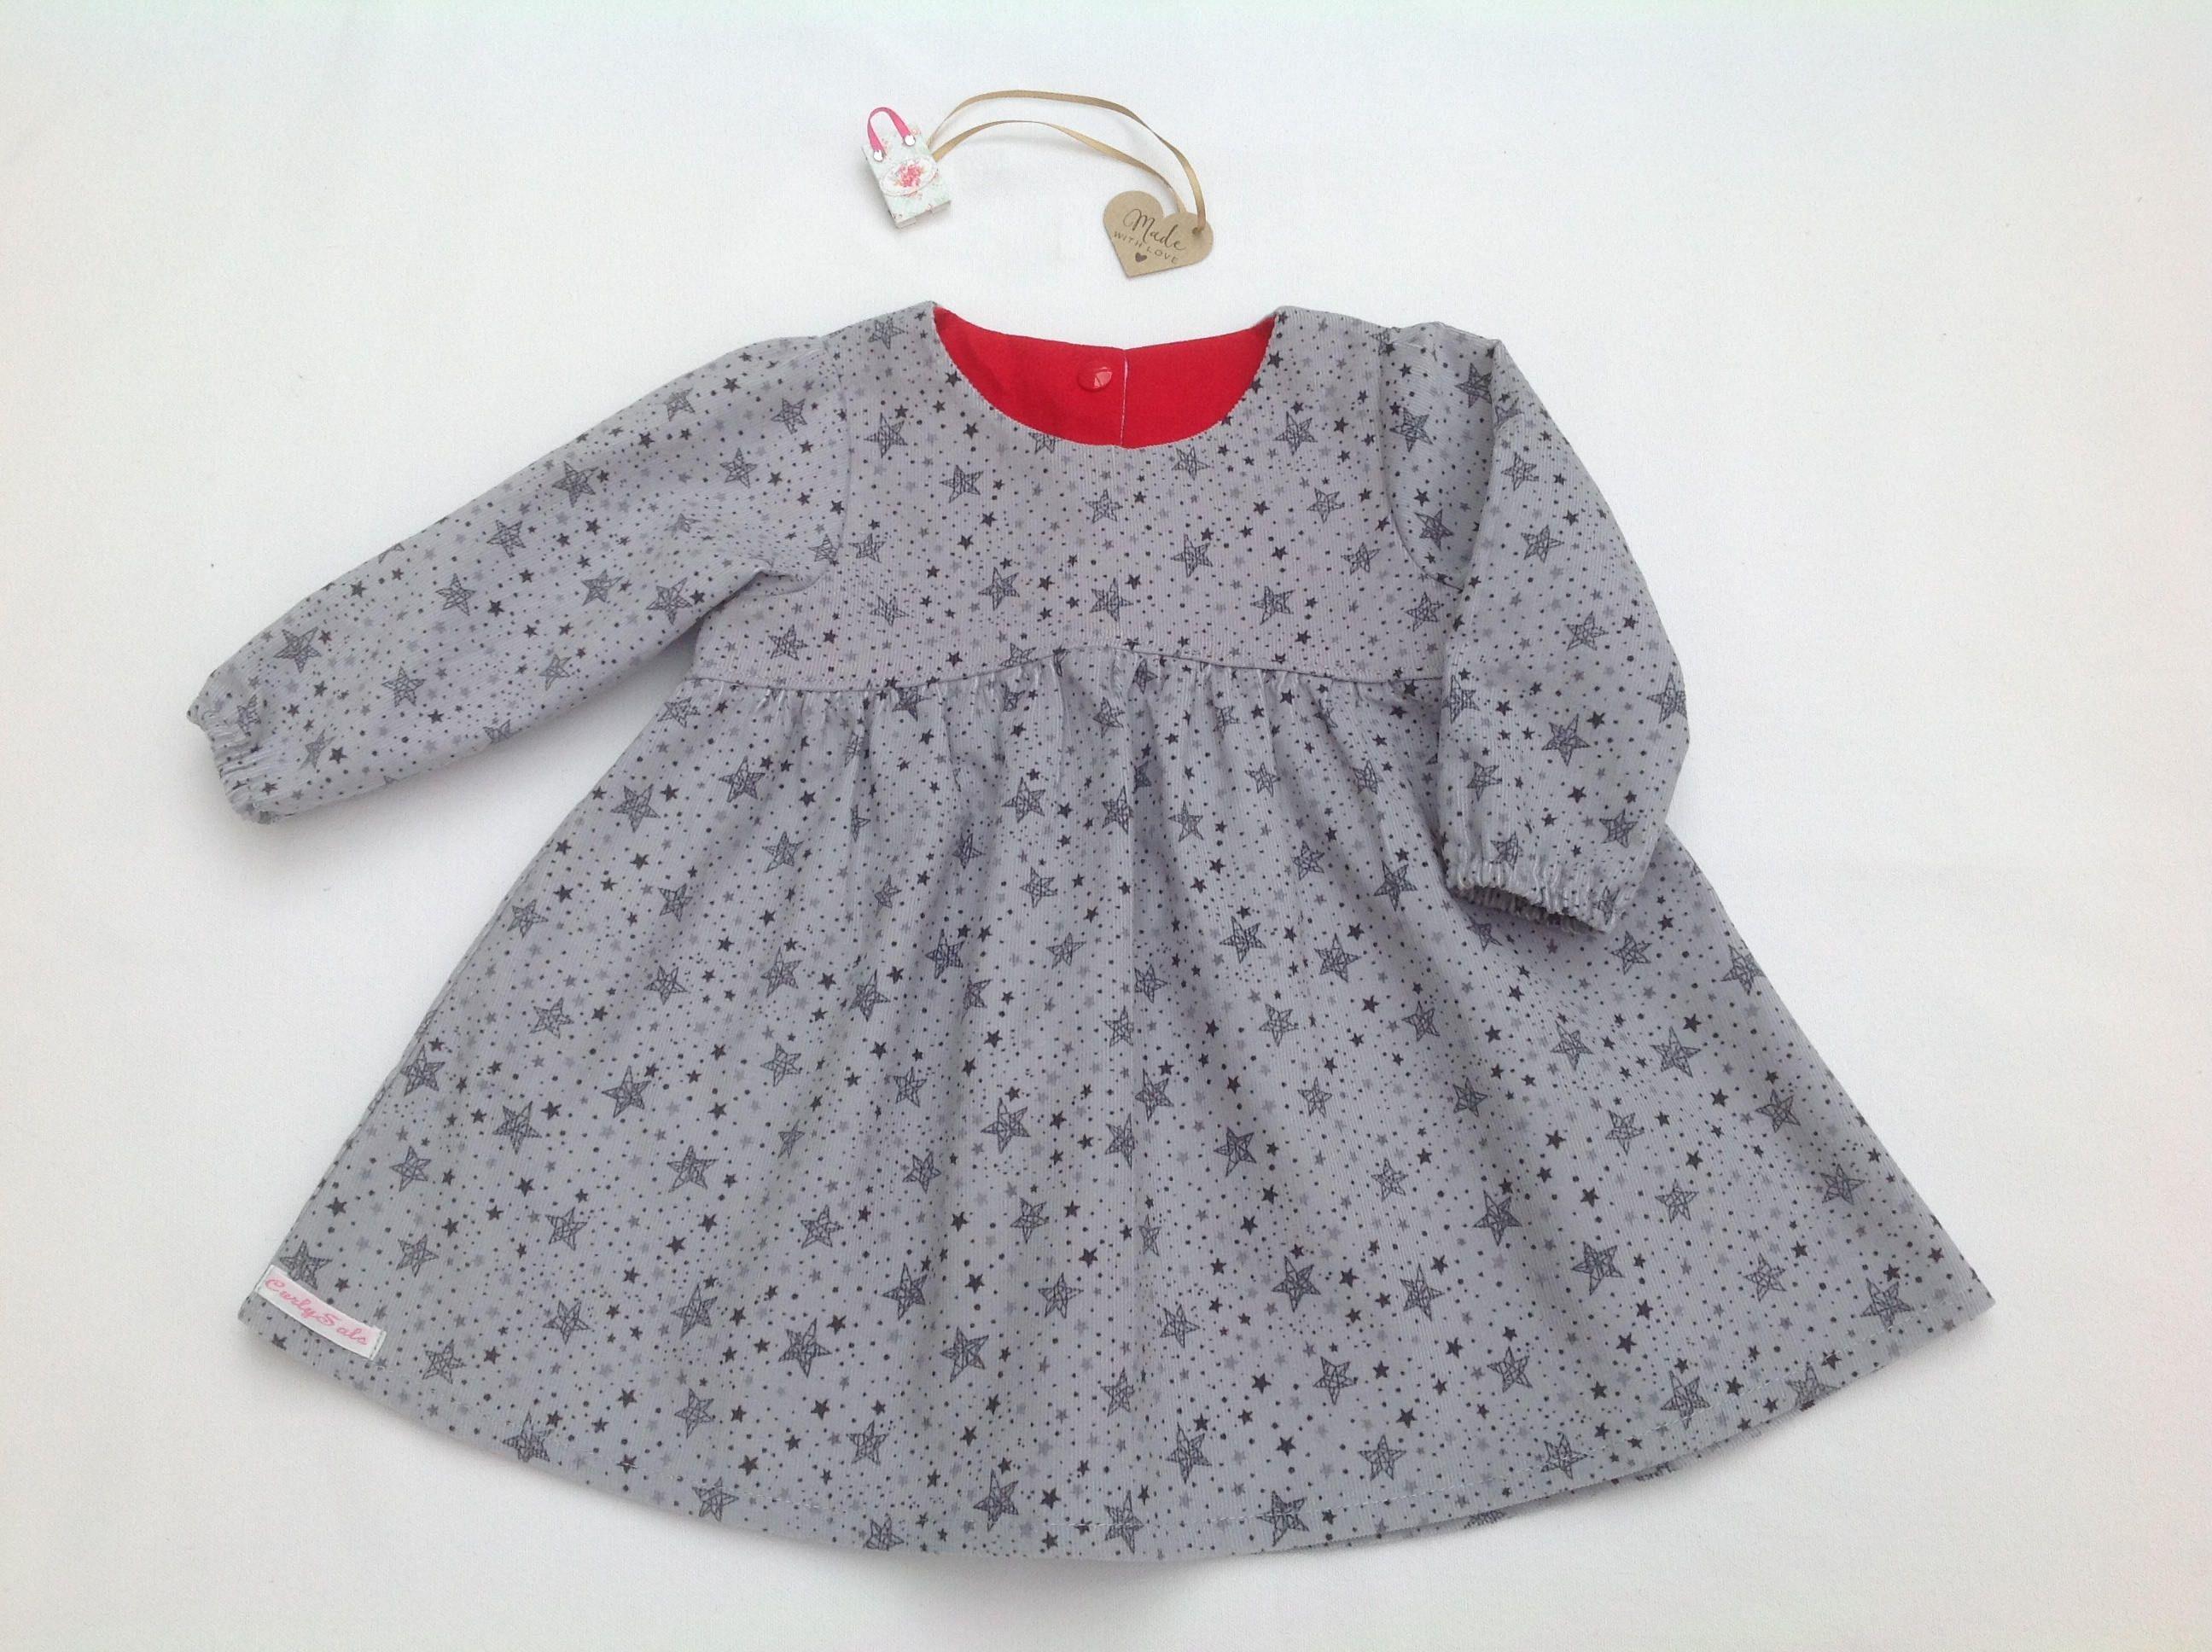 Long sleeve Dress Baby dress girls grey dress stars baby cord